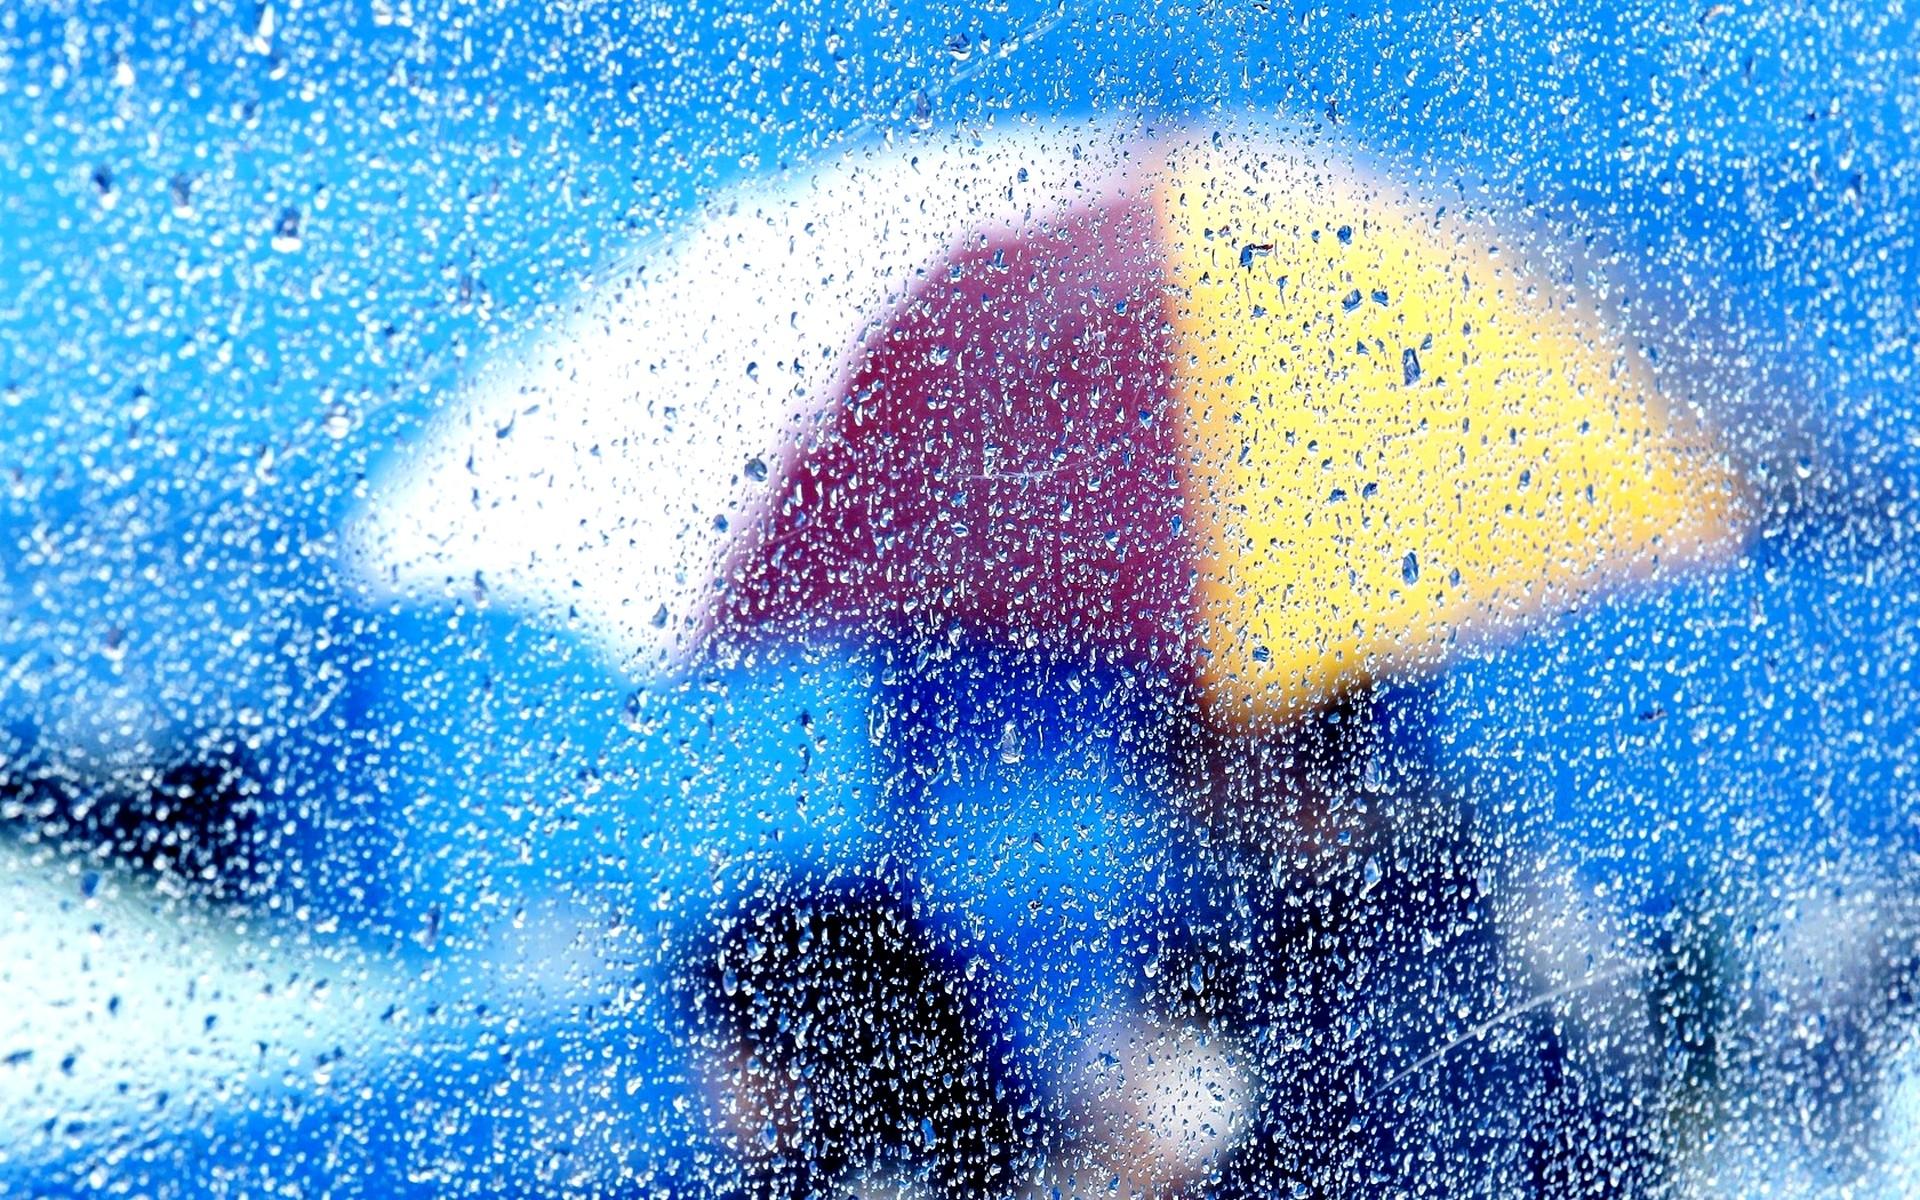 Rain Hd Wallpaper 75 Images